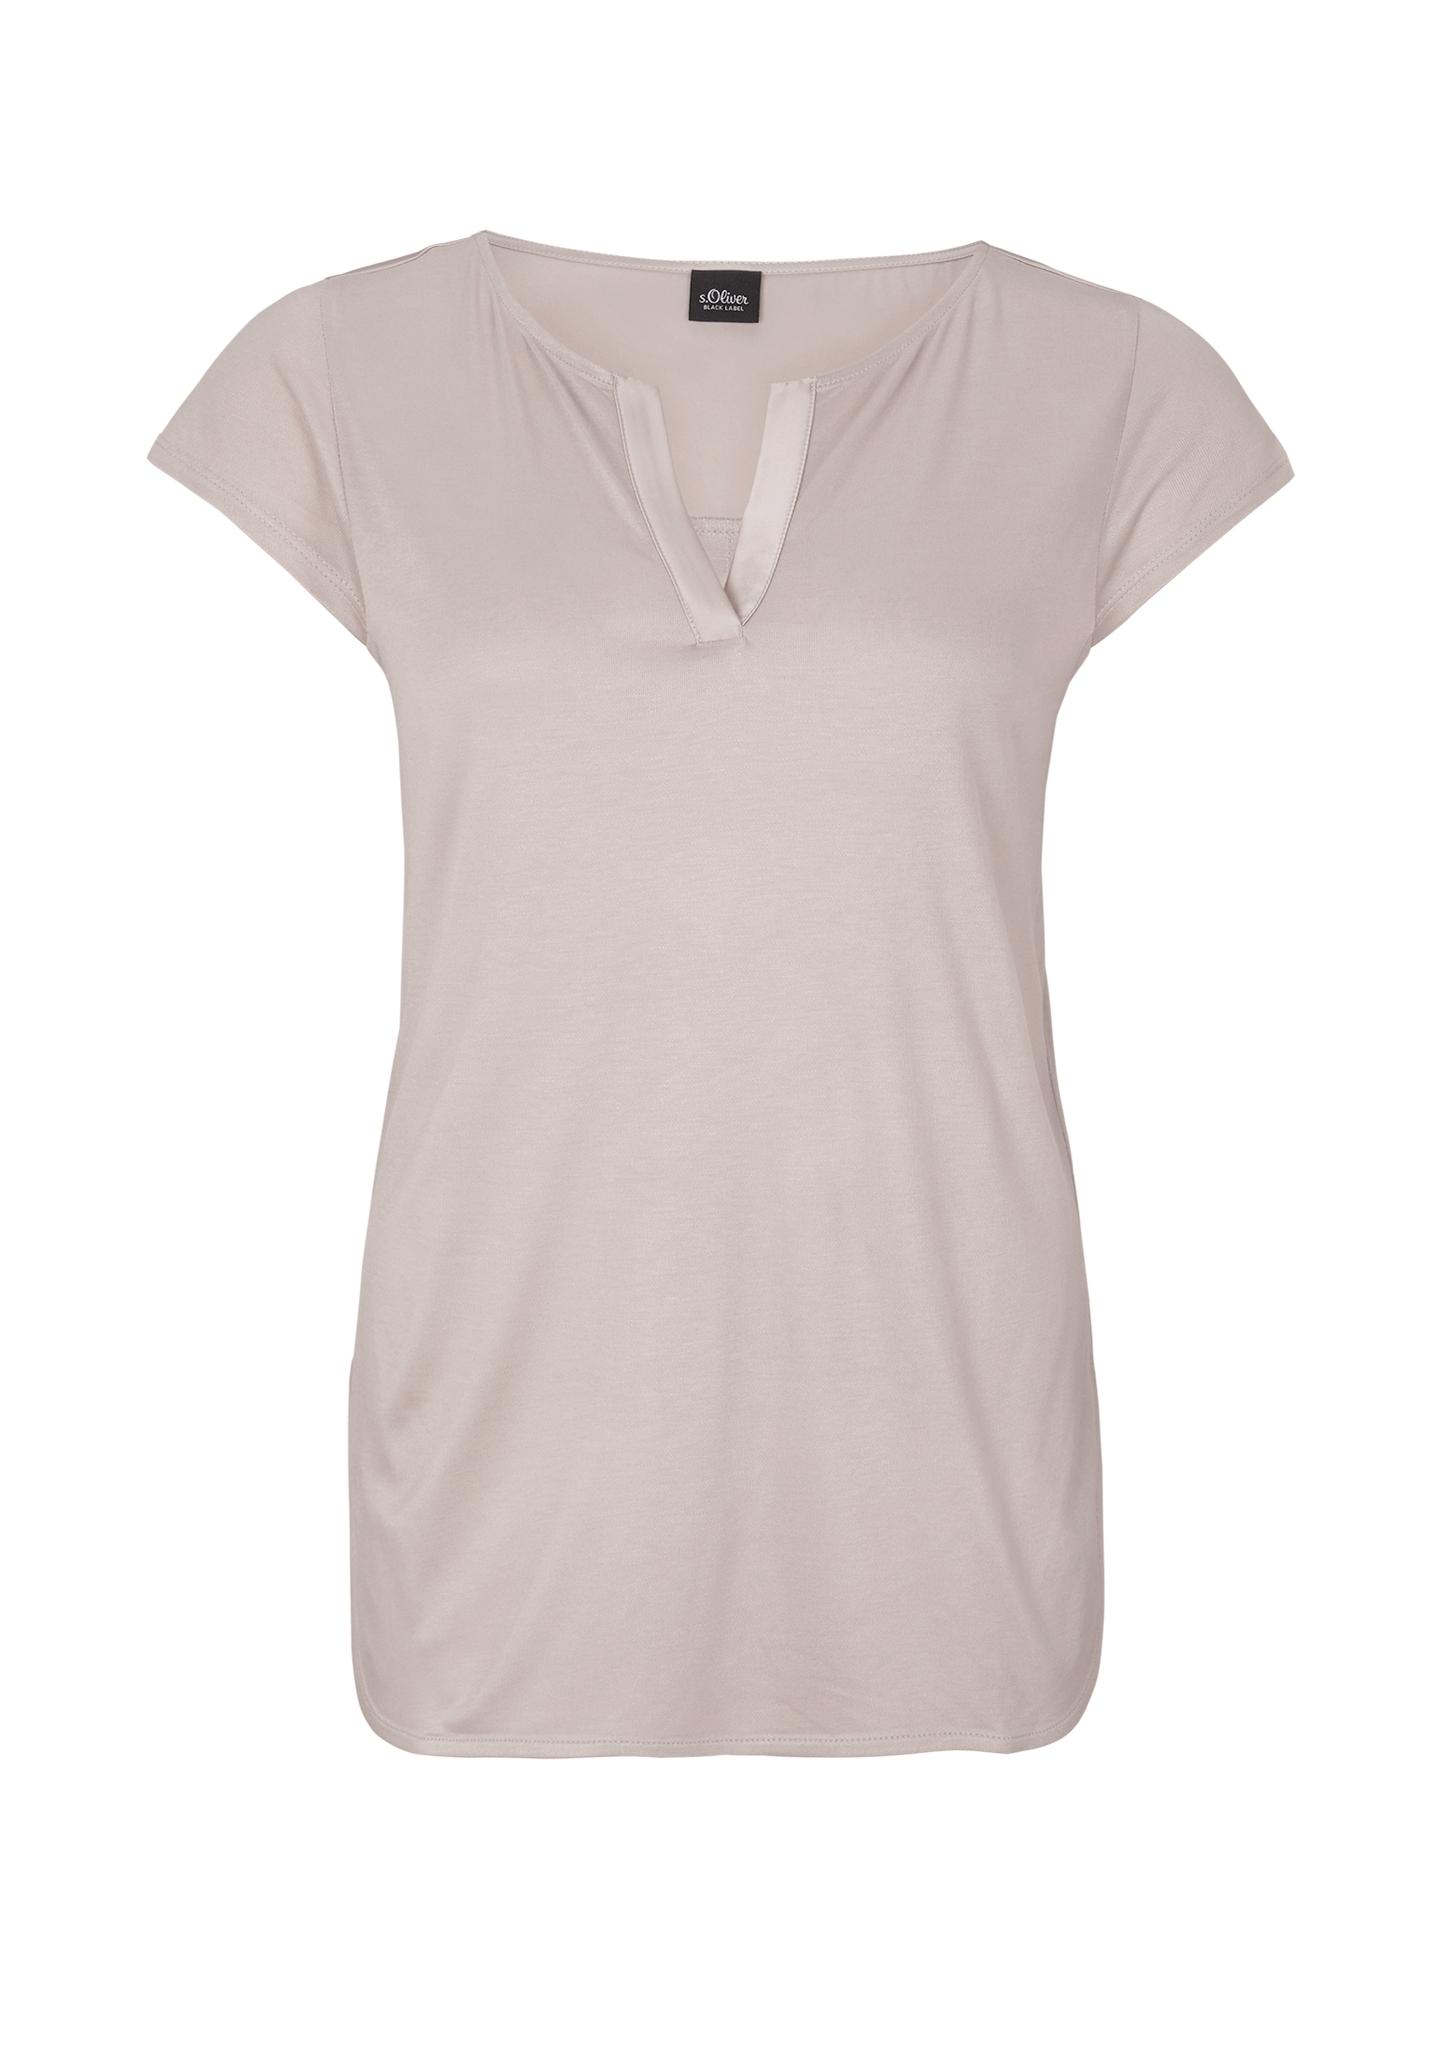 Tunikashirt | Bekleidung > Shirts > Tunikashirts | Beige | Oberstoff a 100% viskose| oberstoff b: 96% polyester -  4% elasthan | s.Oliver BLACK LABEL